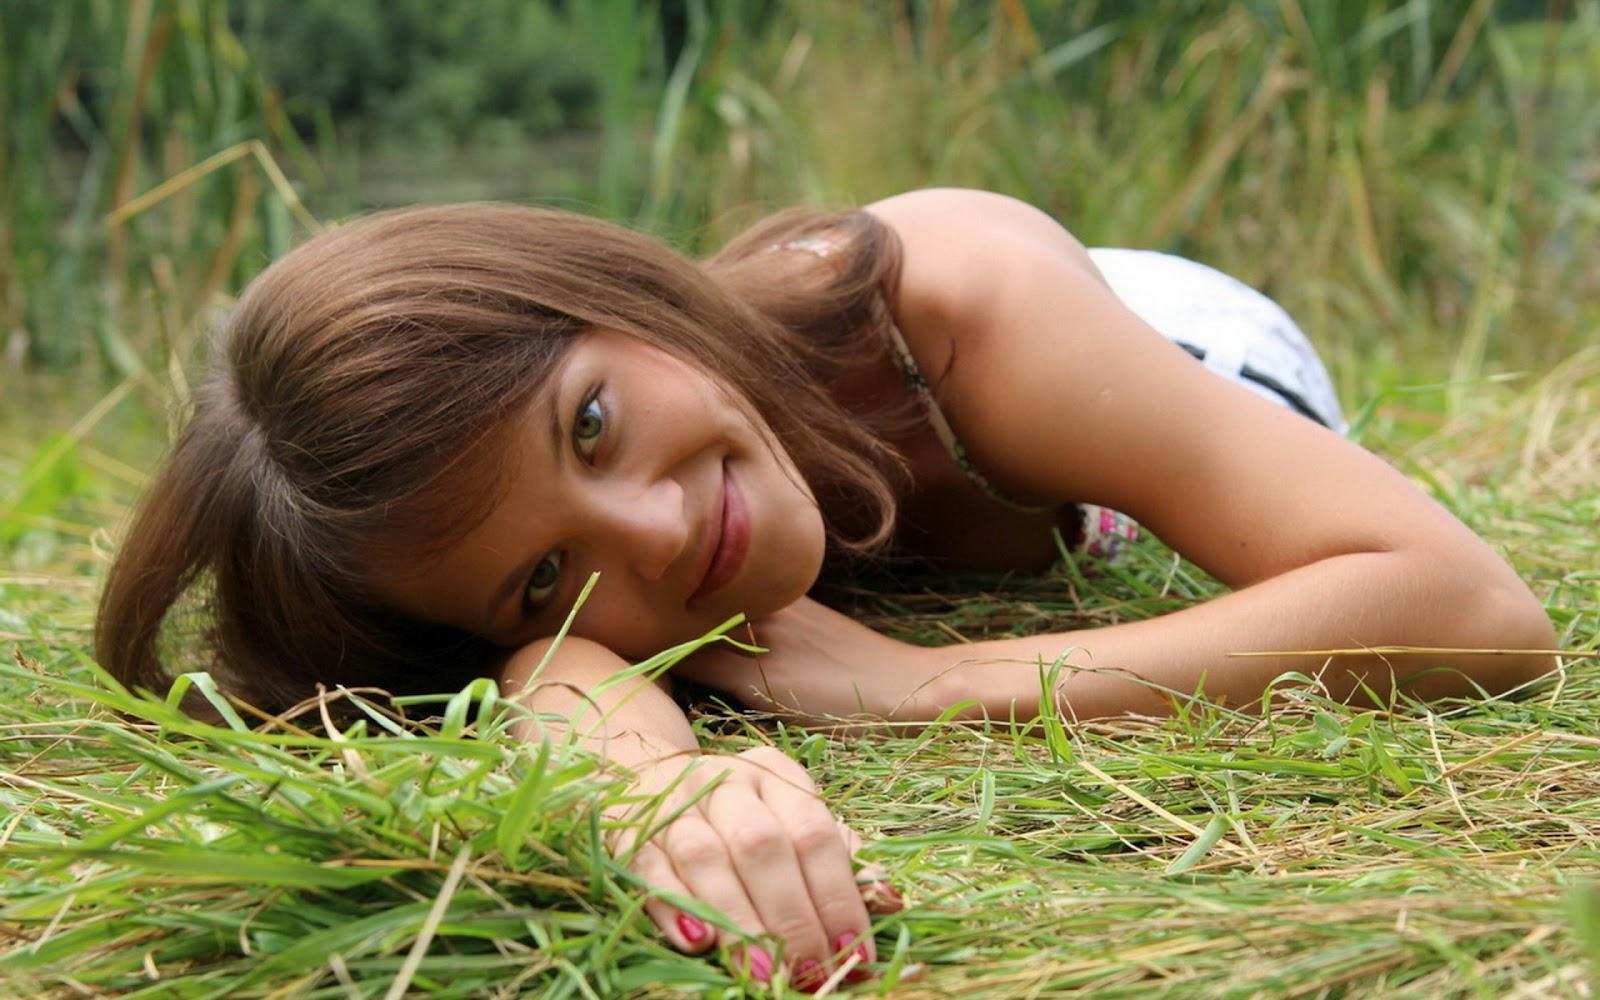 Эротика hd онлайн молоденькие 10 фотография